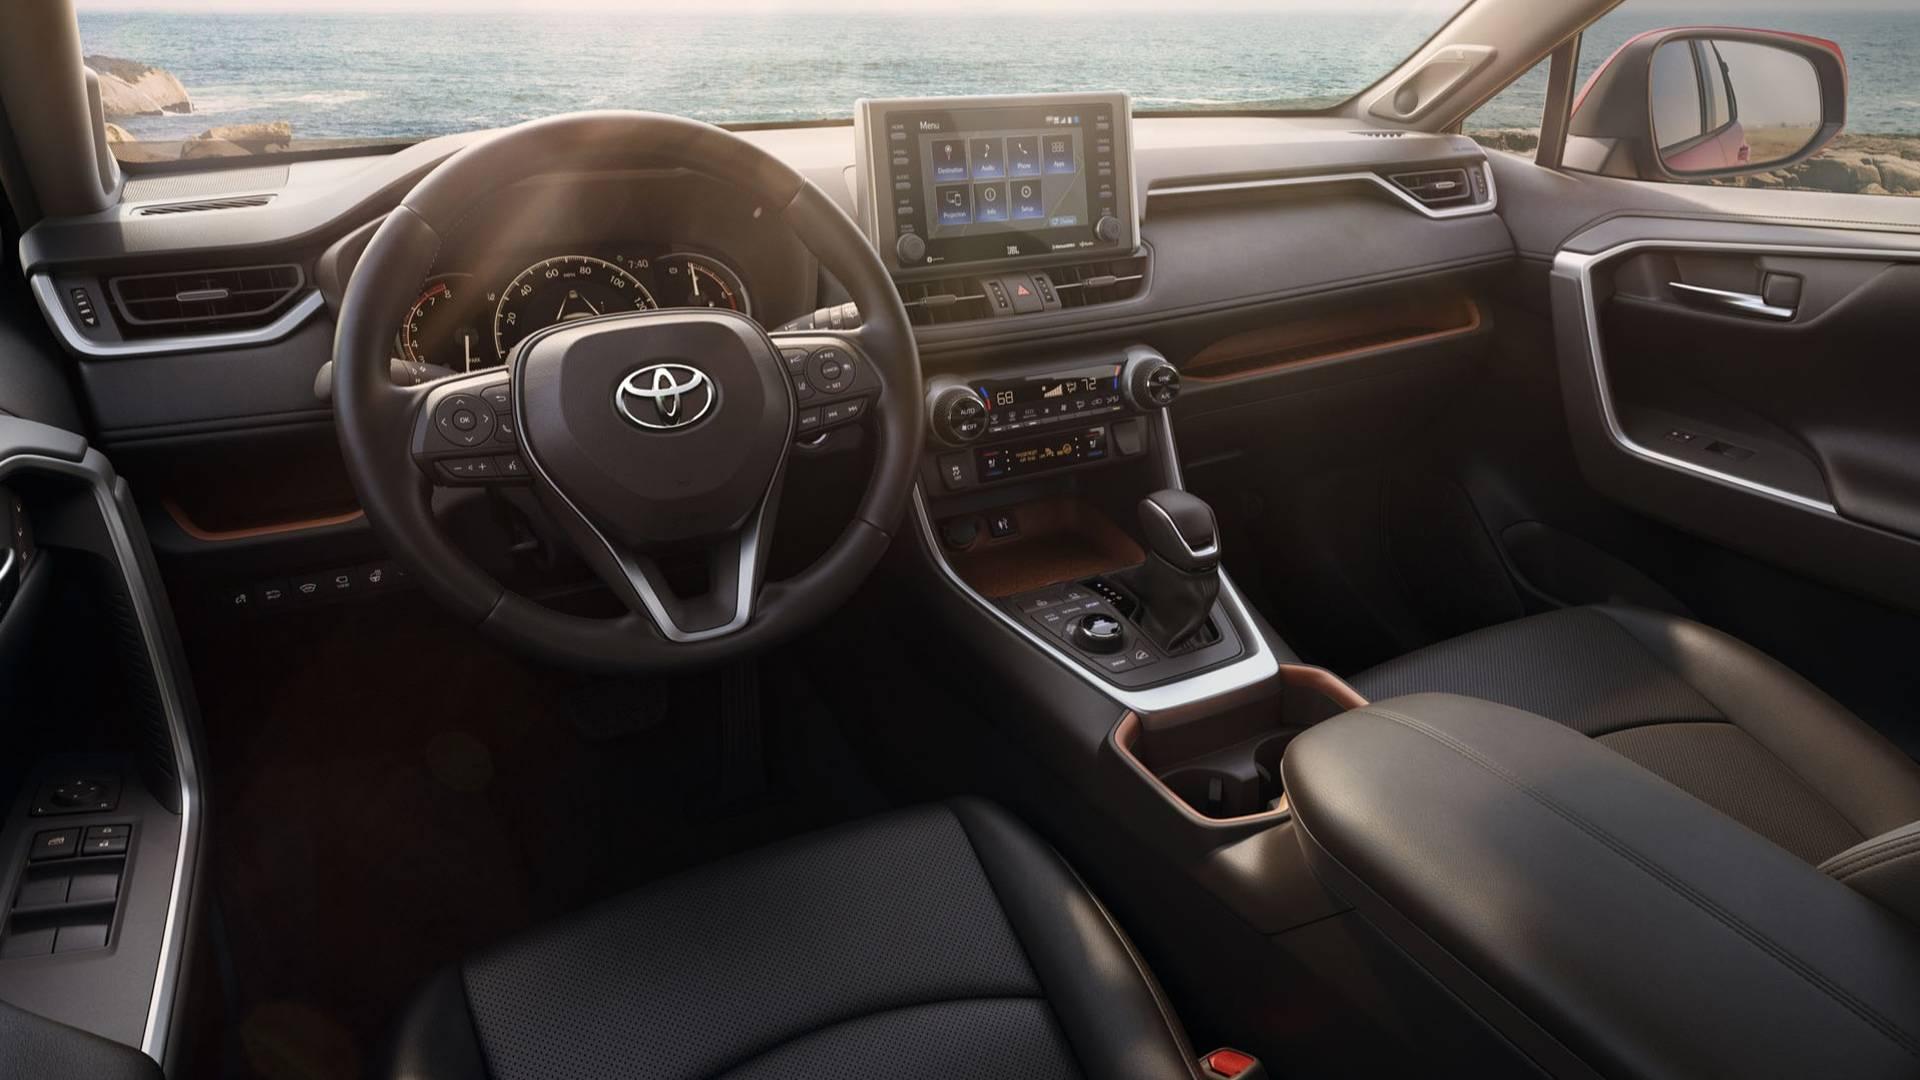 Toyota Puts The Spotlight On The 2019 Rav4 With Promo Videos